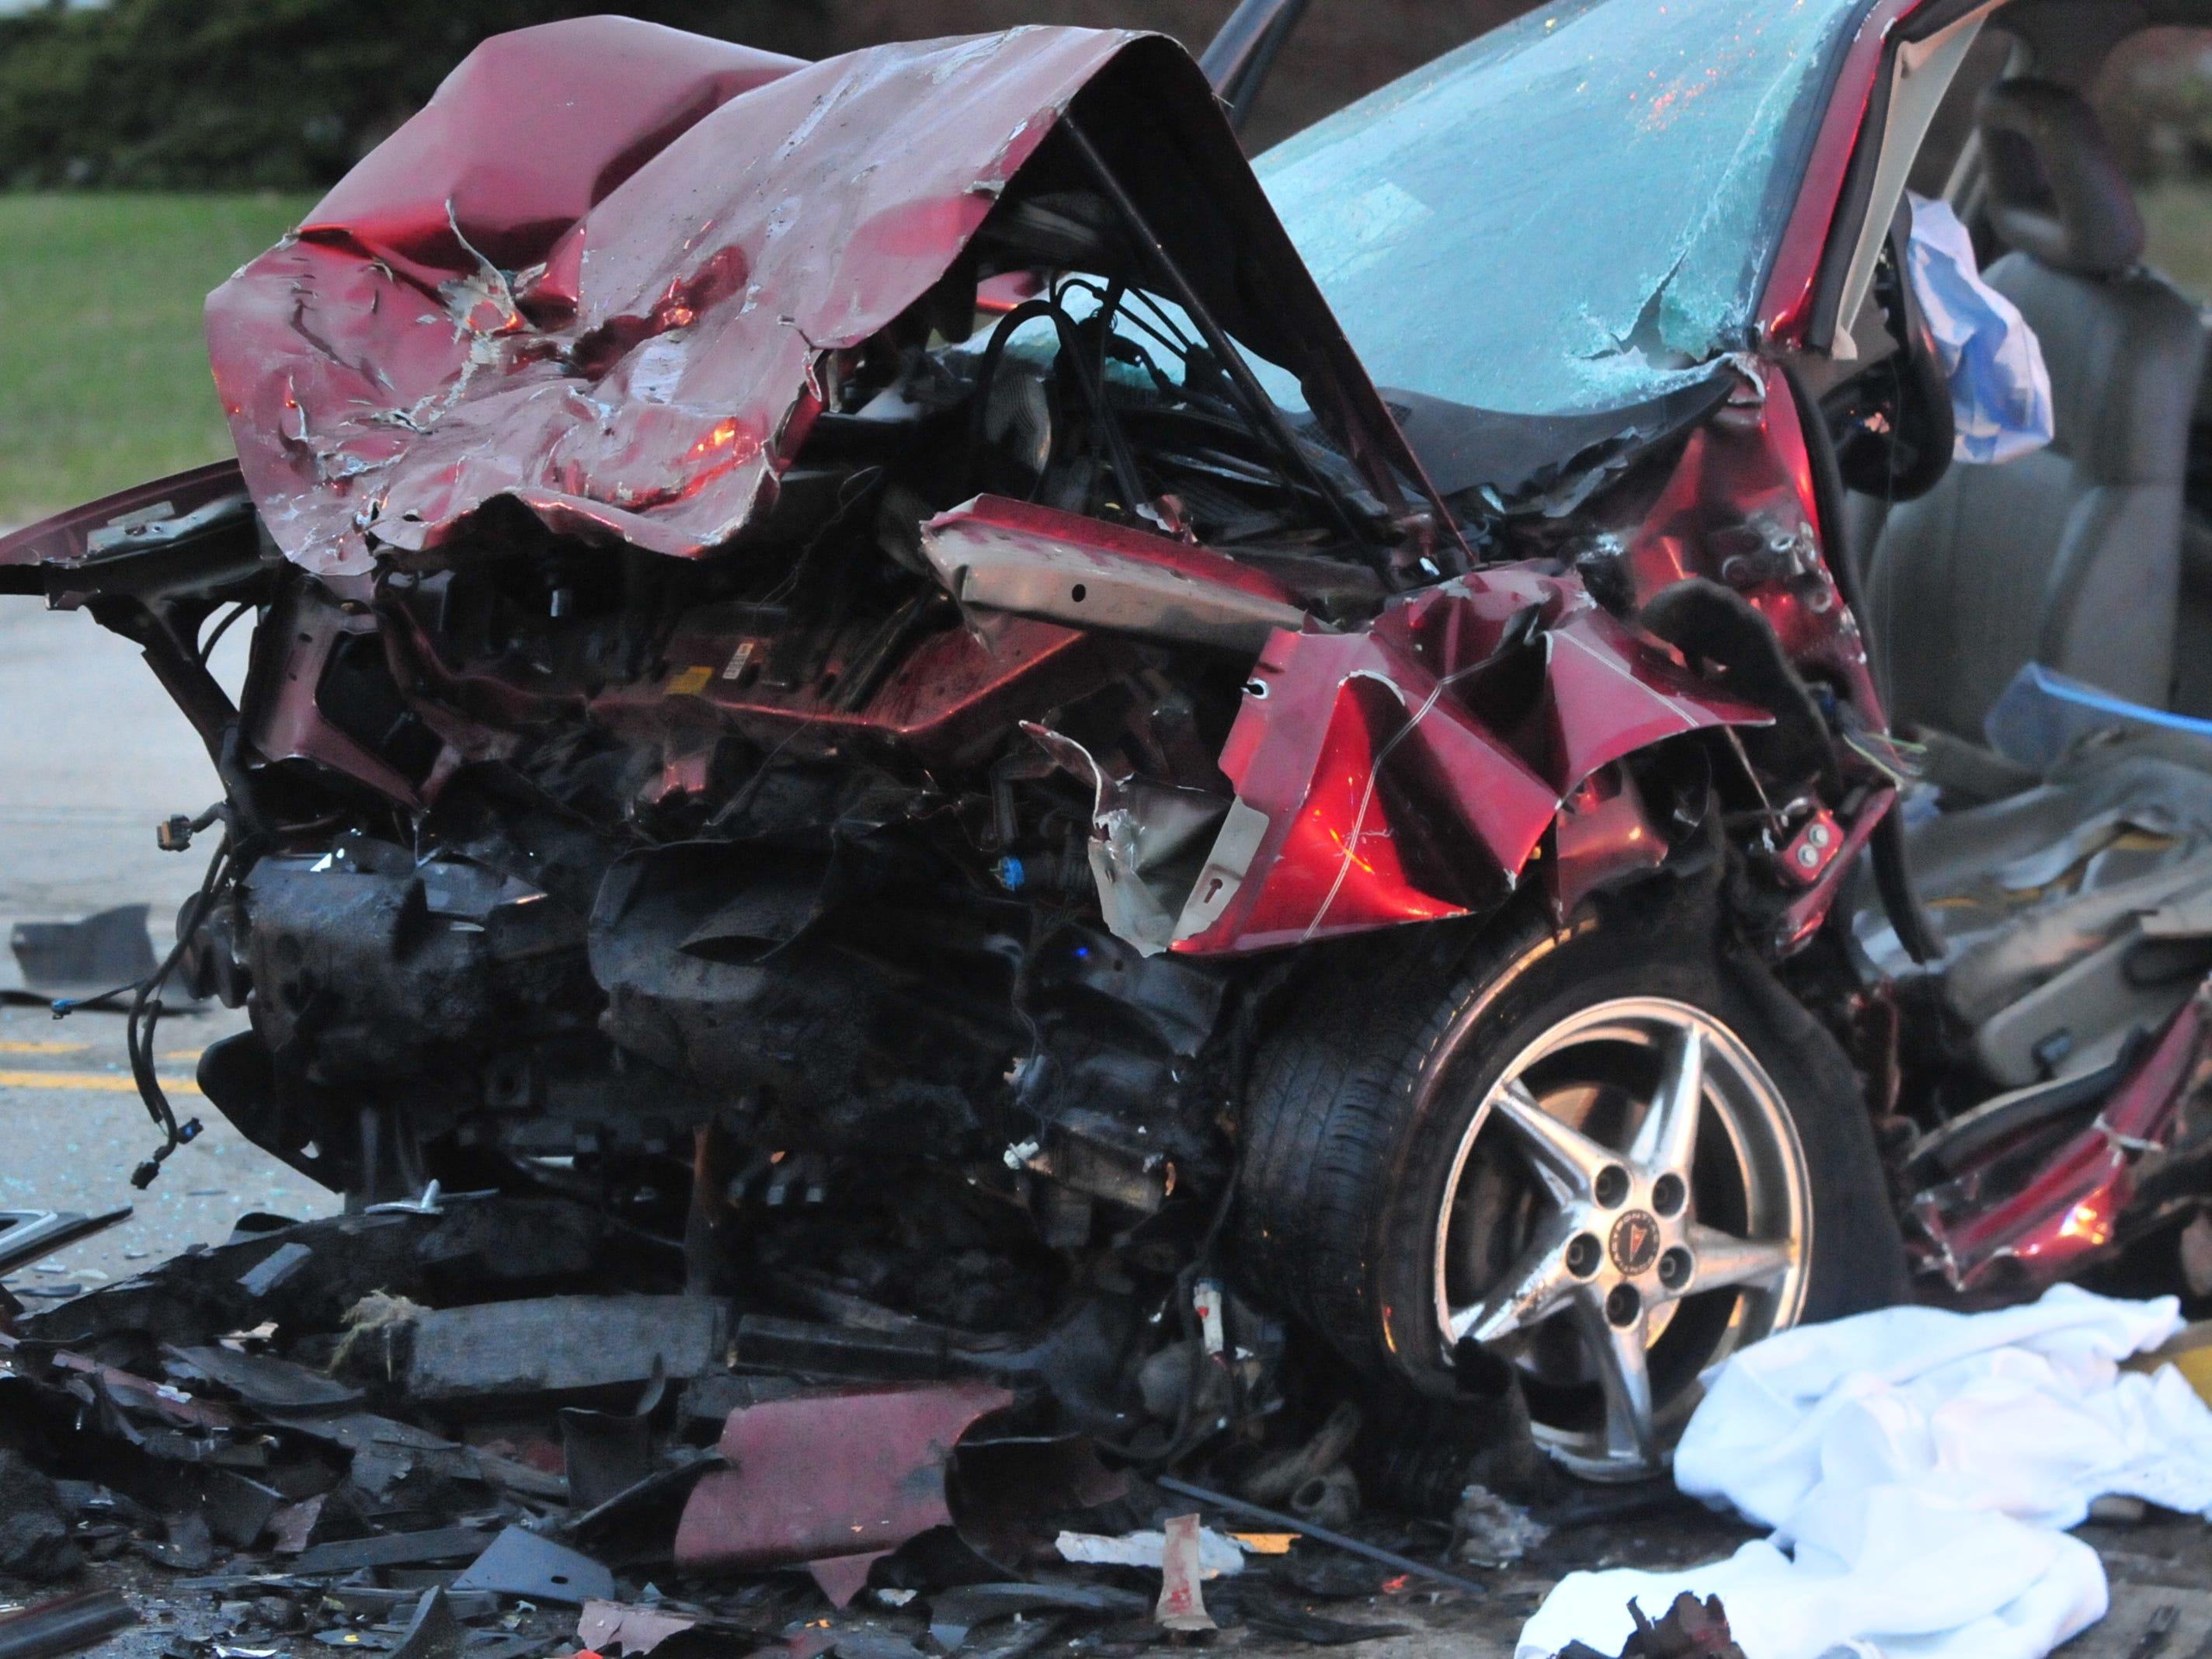 A Pontiac Grand Prix was damaged during a head-on collision Tuesday on Salisbury Road.